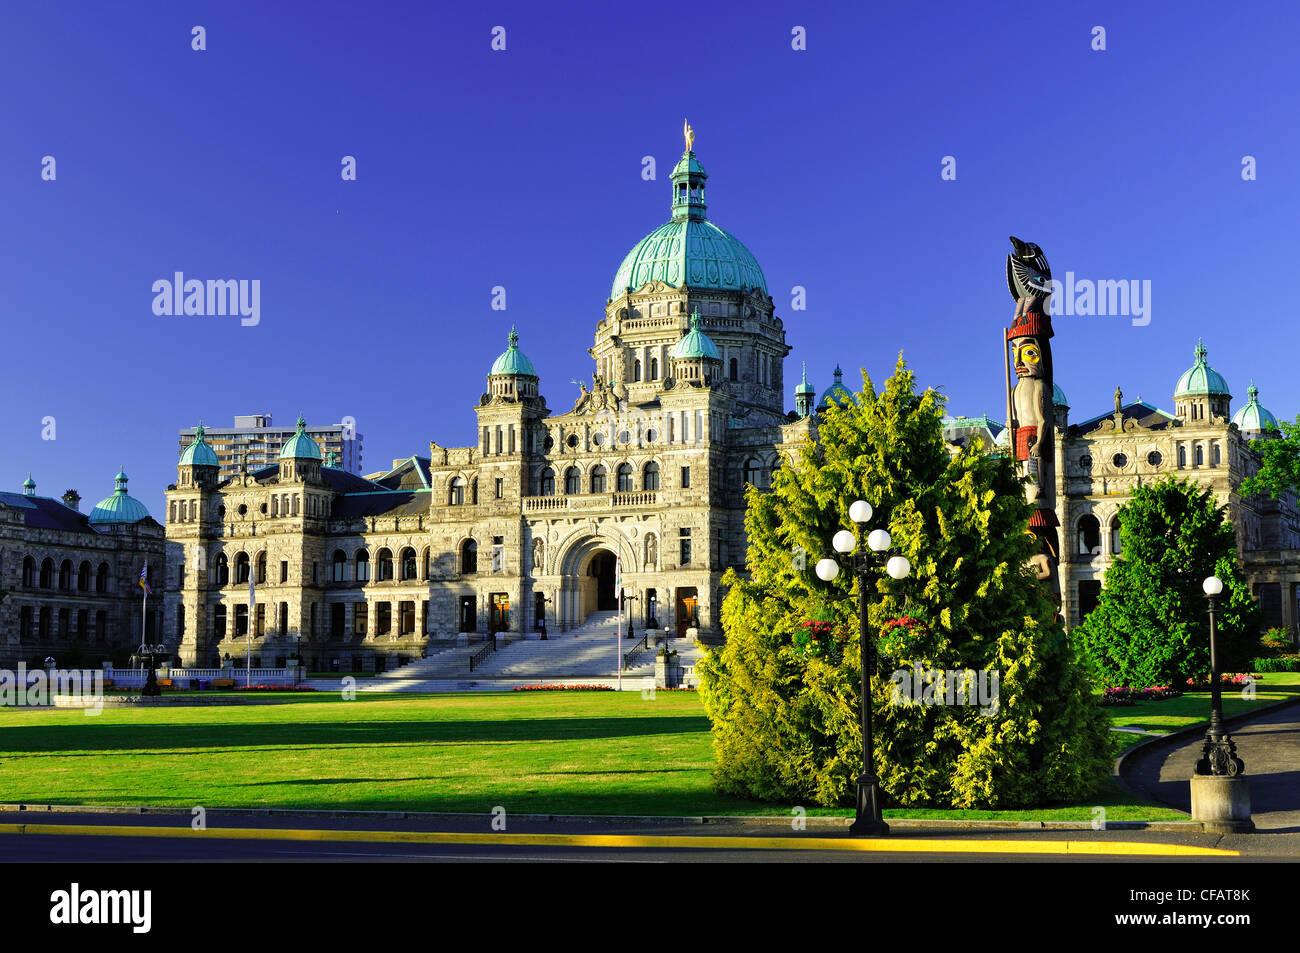 Parlamentsgebäude und Totempfahl, Victoria, Vancouver Island, British Columbia, Kanada Stockfoto